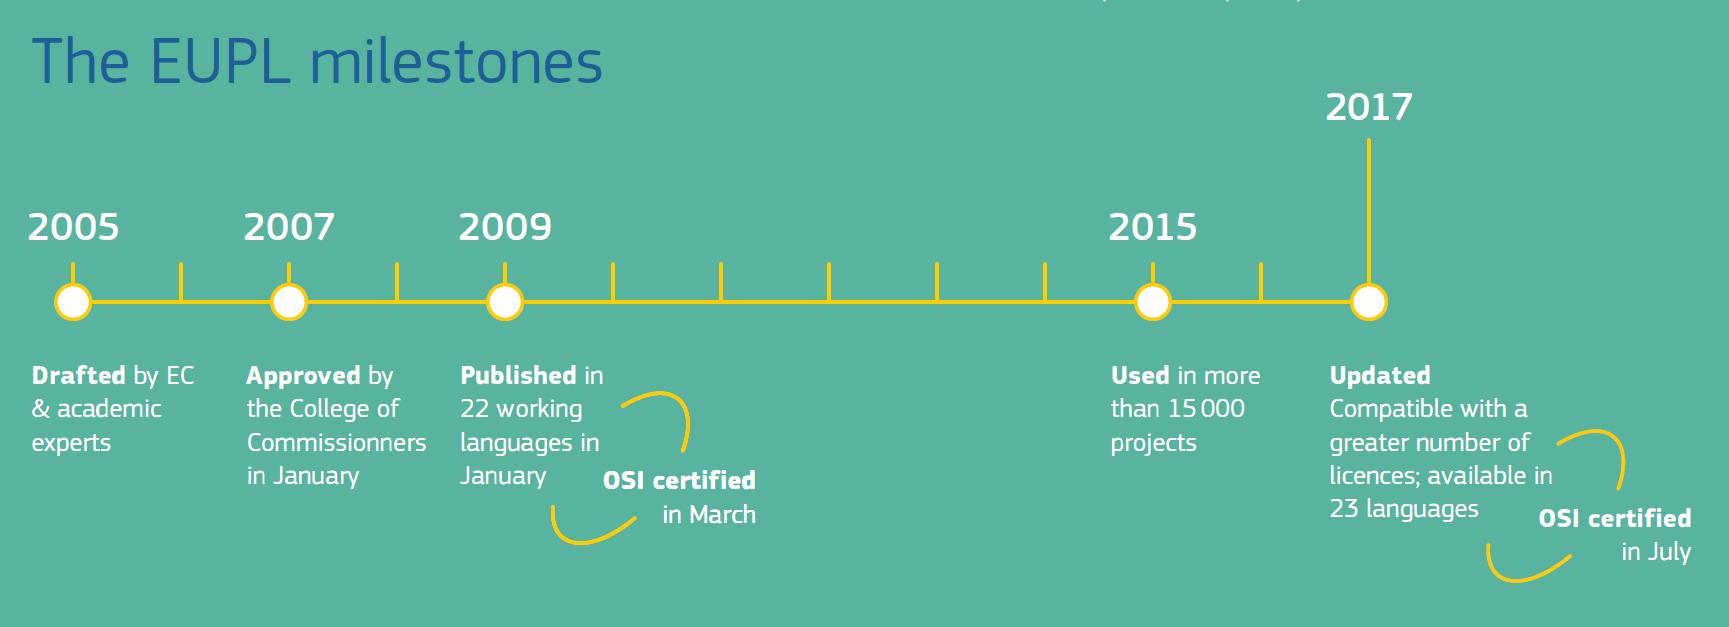 The EUPL milestones